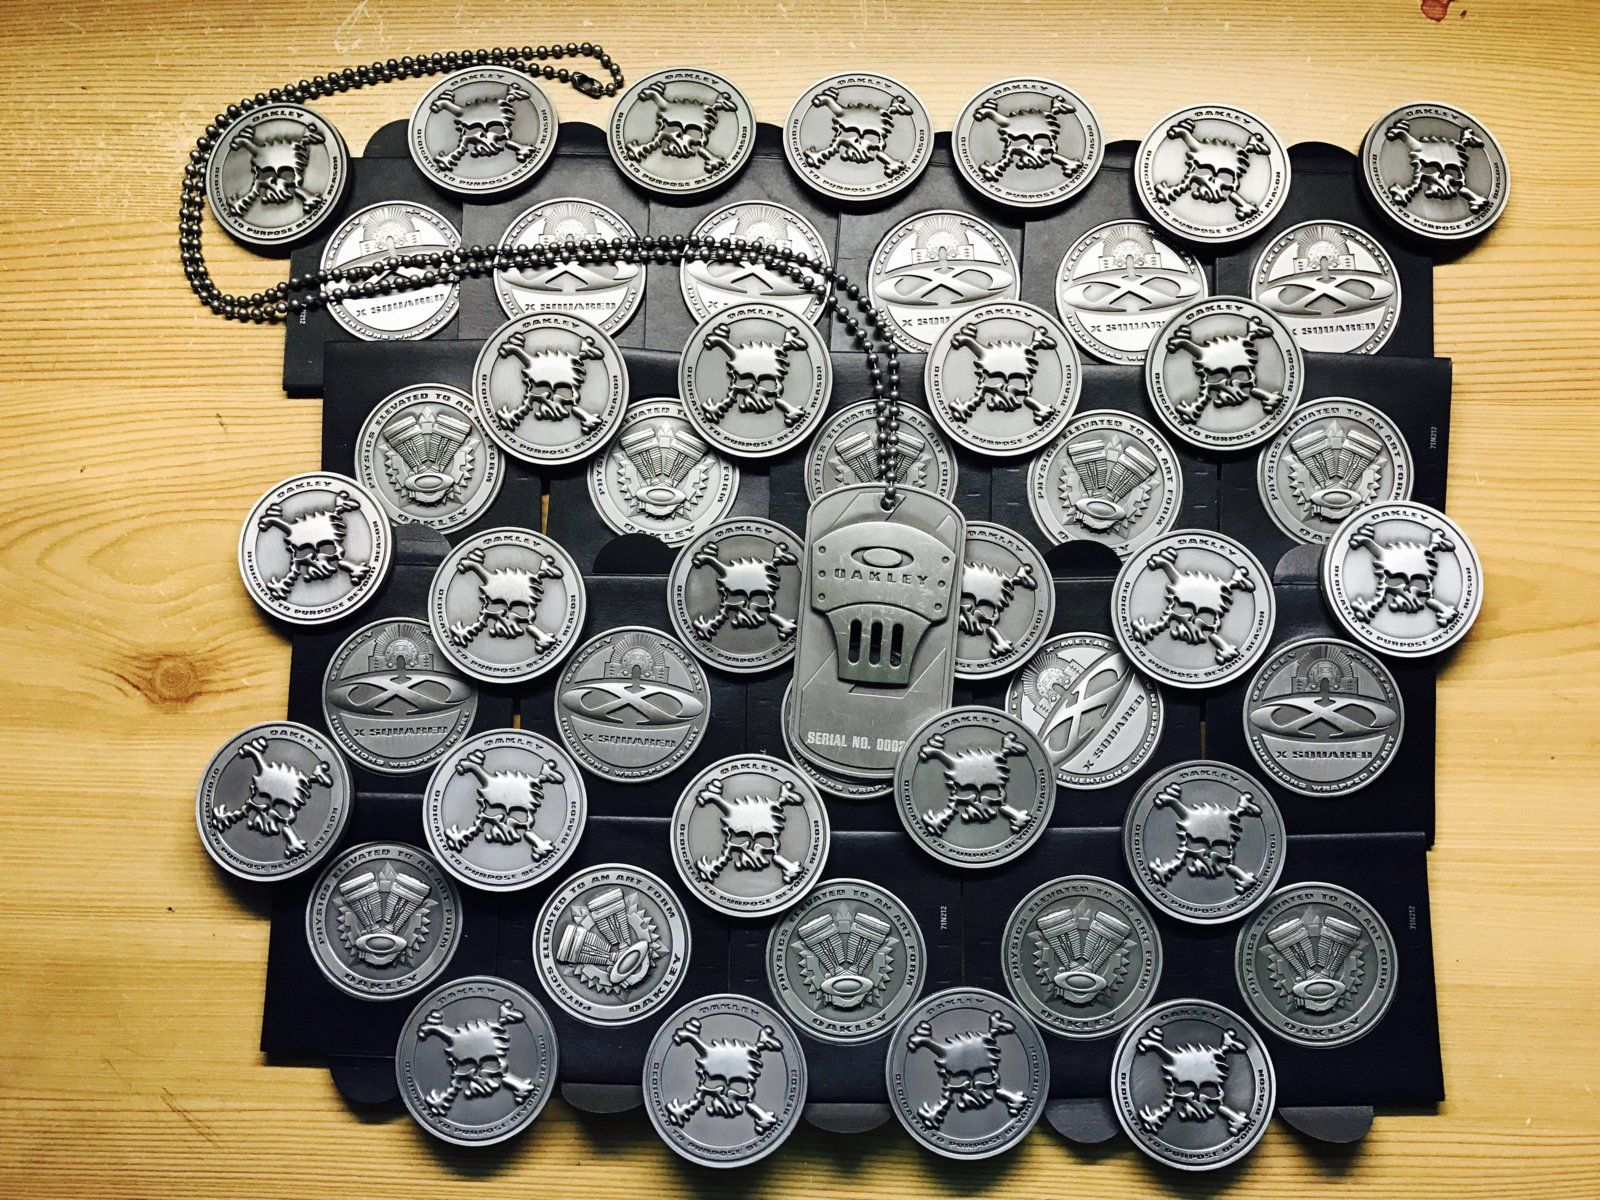 Coins: XX, XS, Penny, Mars, Juliet - IMG_1993.JPG